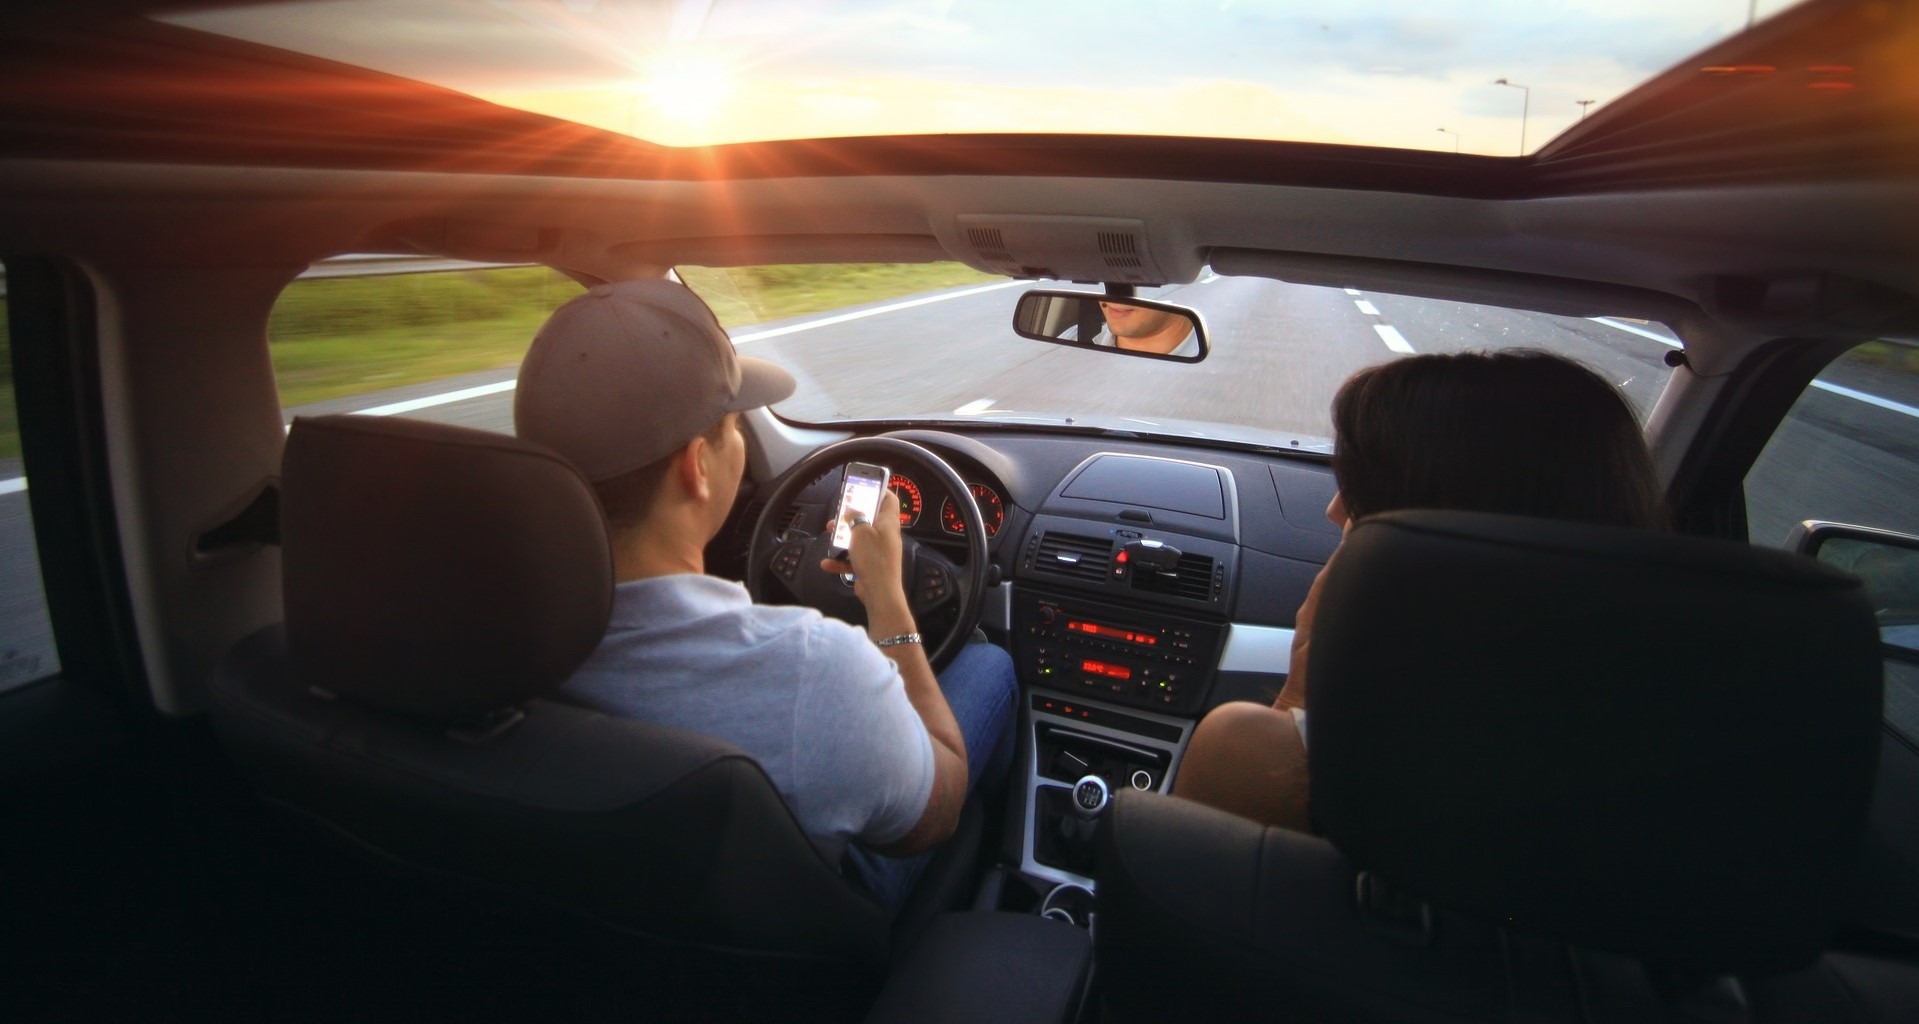 Driving Outdoors in Beaufort South Carolina - GoodwillCarDonation.org